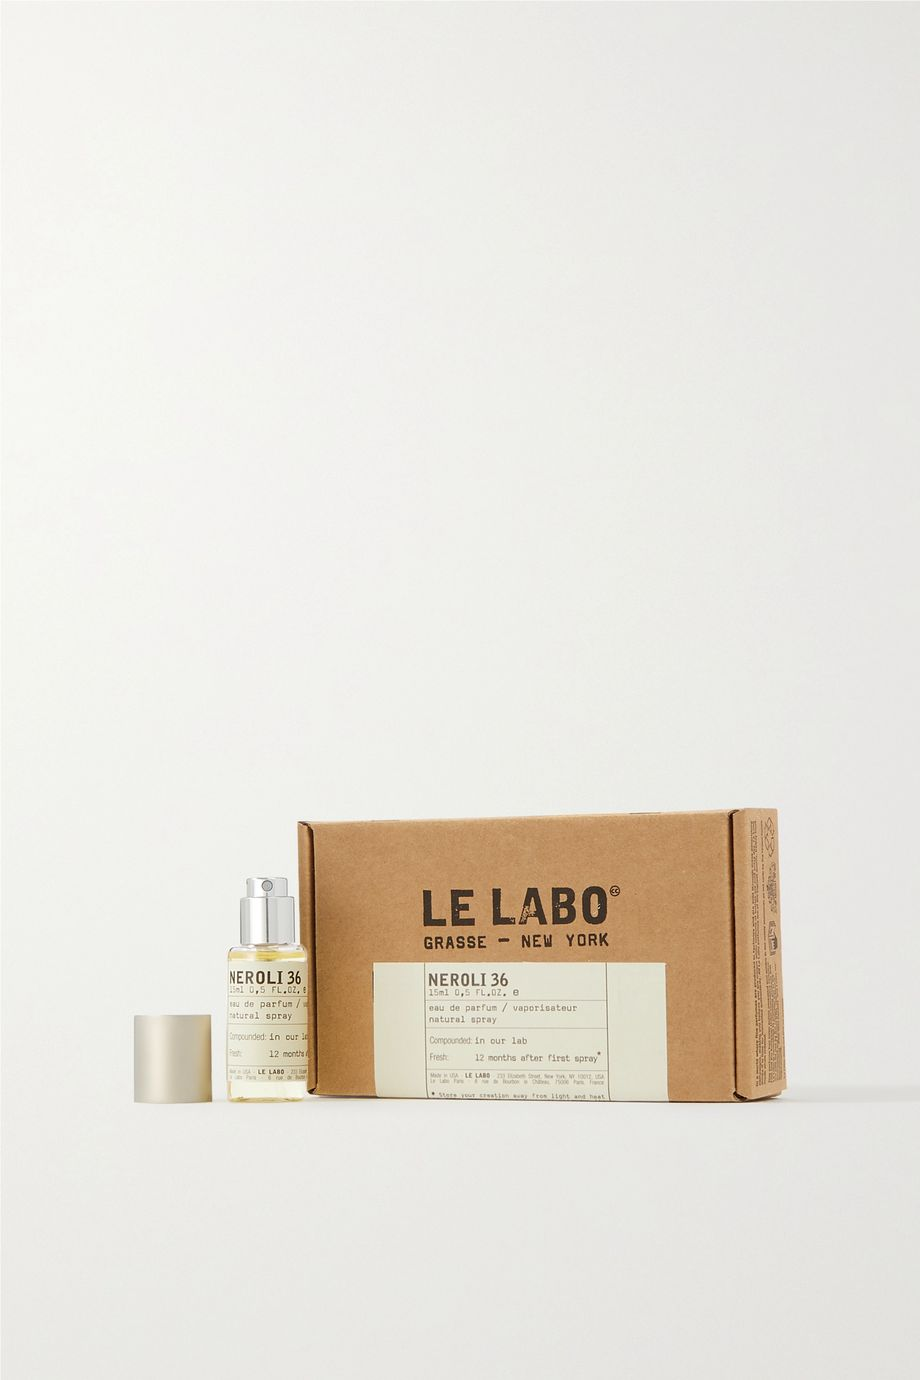 Le Labo Eau de Parfum - Neroli 36, 15ml